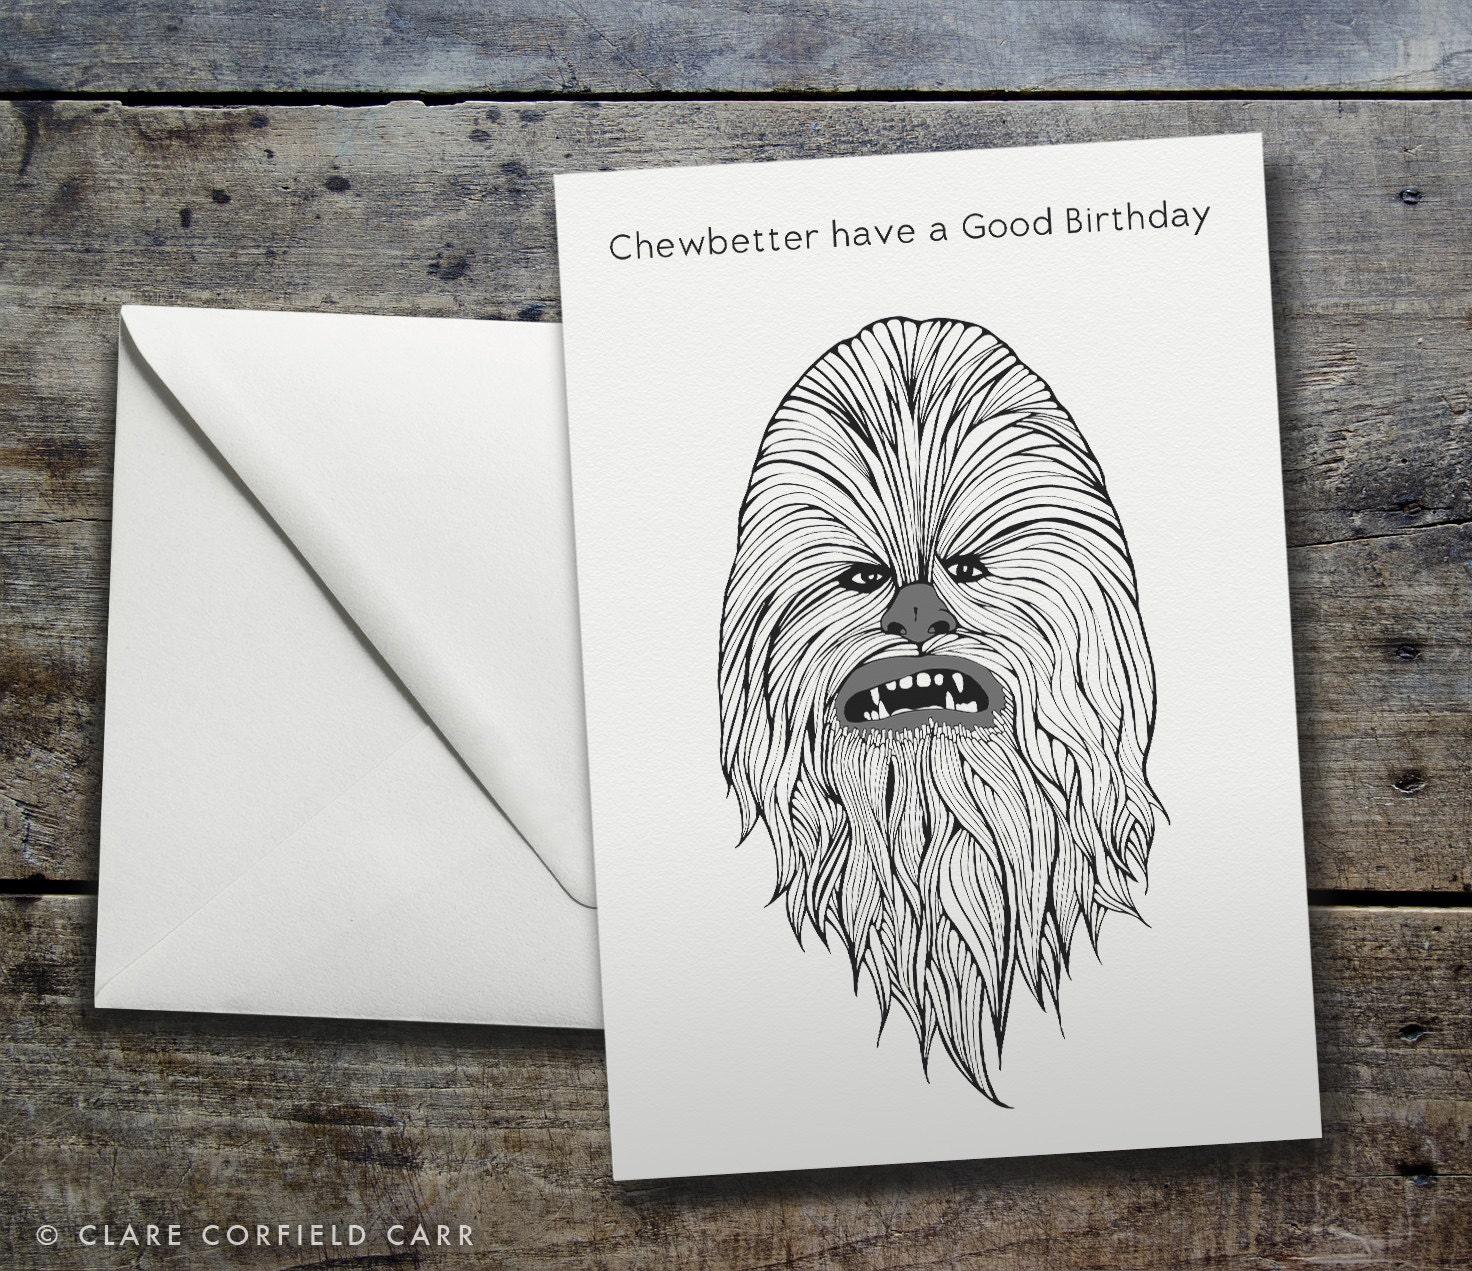 Star wars birthday card gangcraft funny star wars birthday card chewbetter have a good birthday card bookmarktalkfo Choice Image